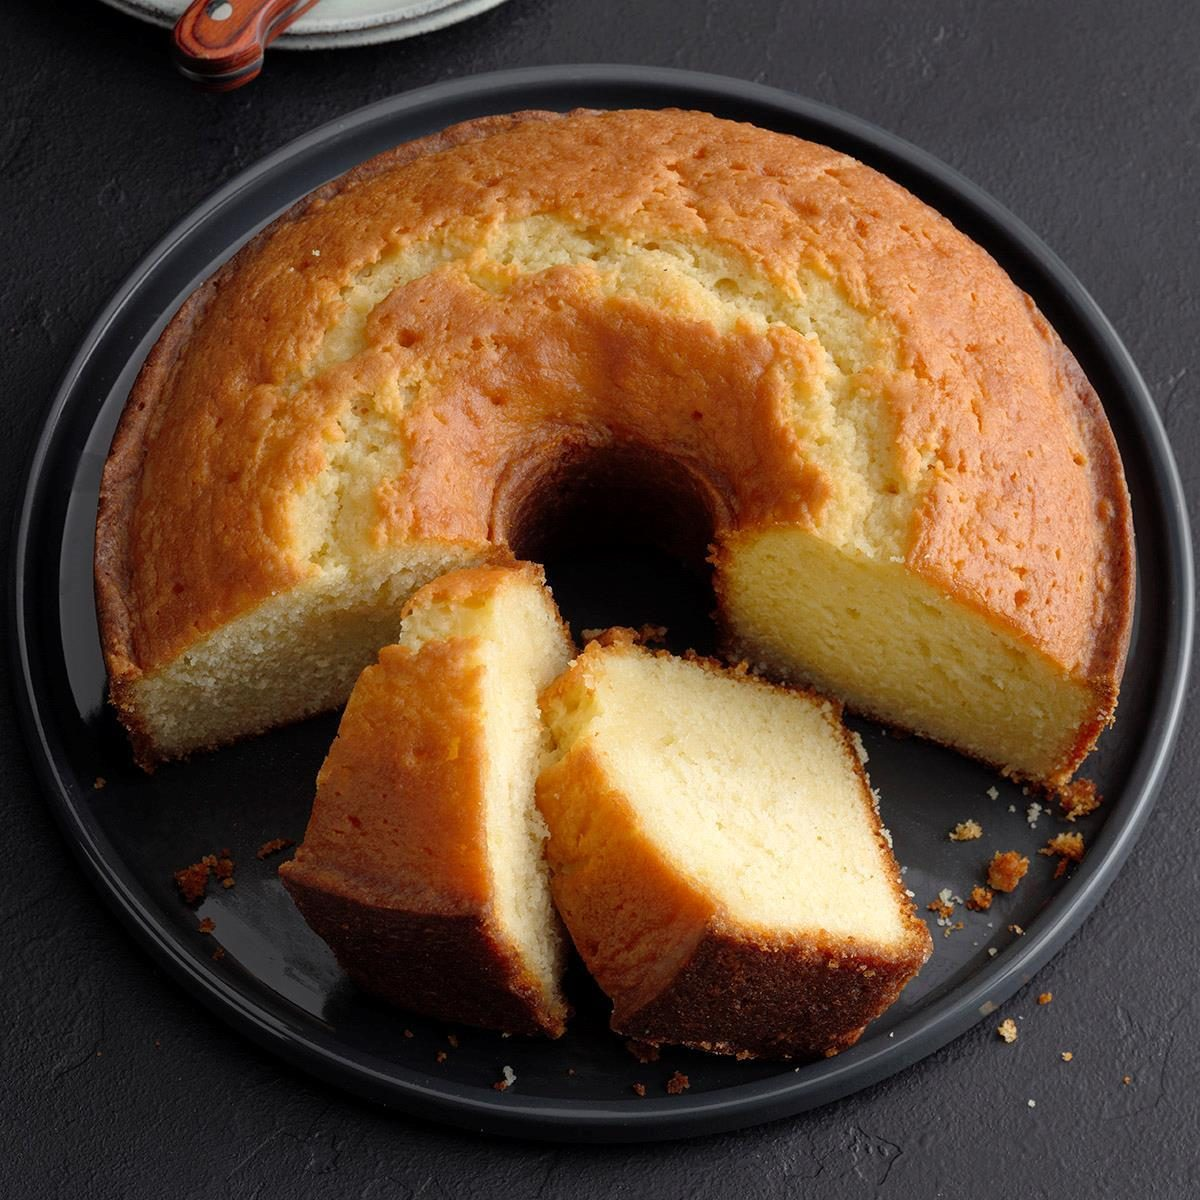 Blue Ribbon Butter Cake Exps Ghbz18 37065 B08 15 1b 9